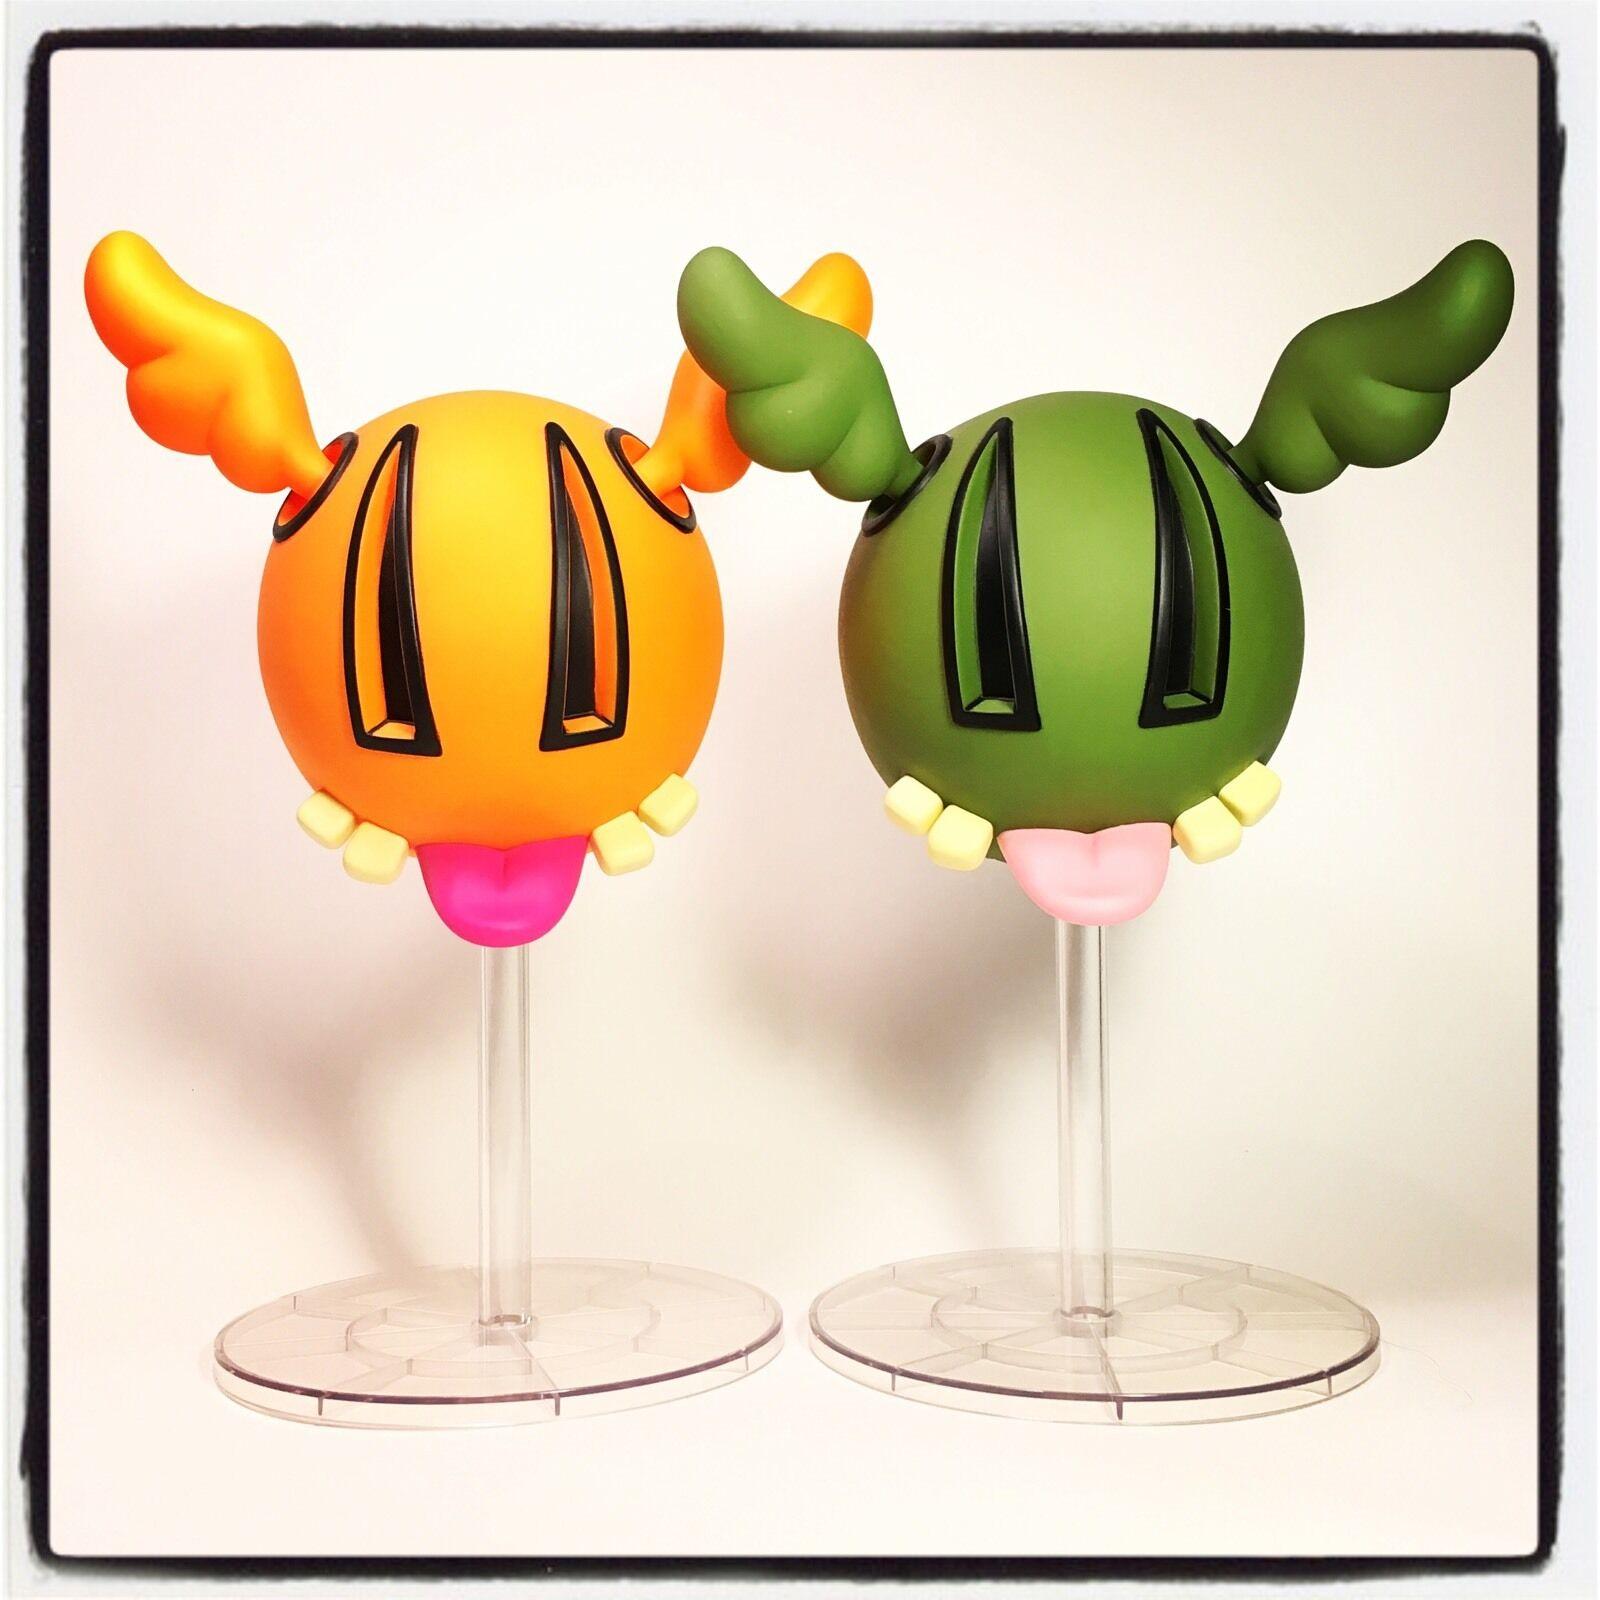 DFace Figure Art Toy (not Threea Coarsetoys)